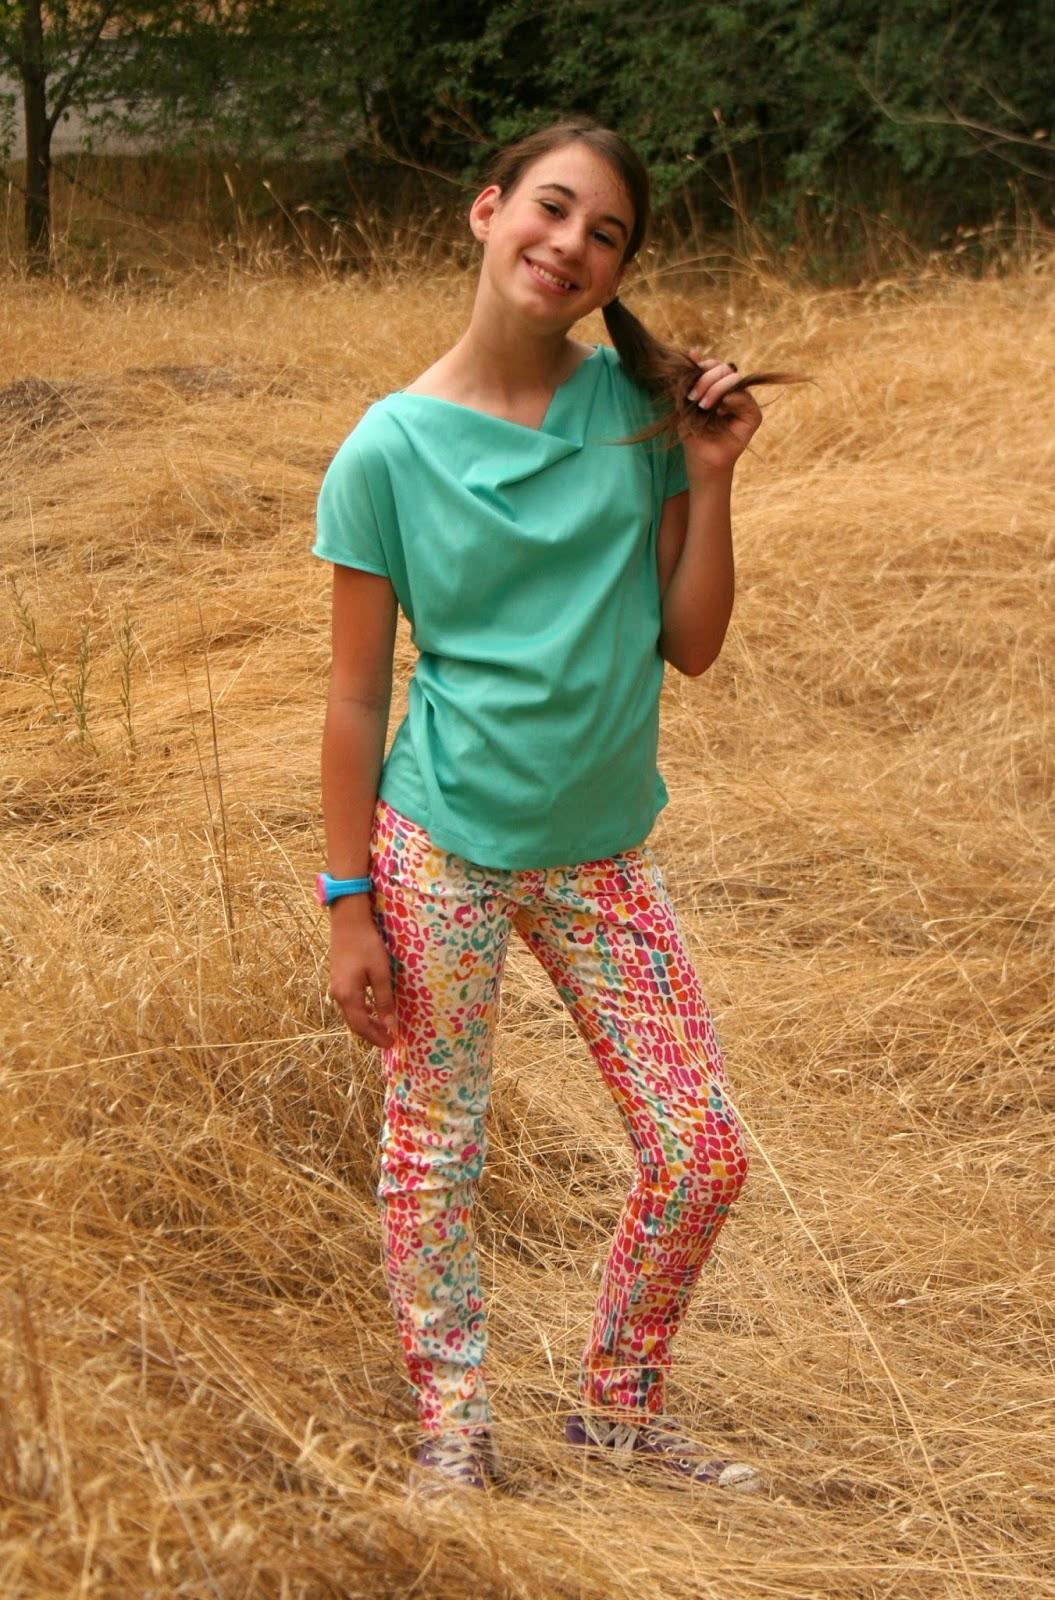 13 year old girls in shorts newhairstylesformen2014 com